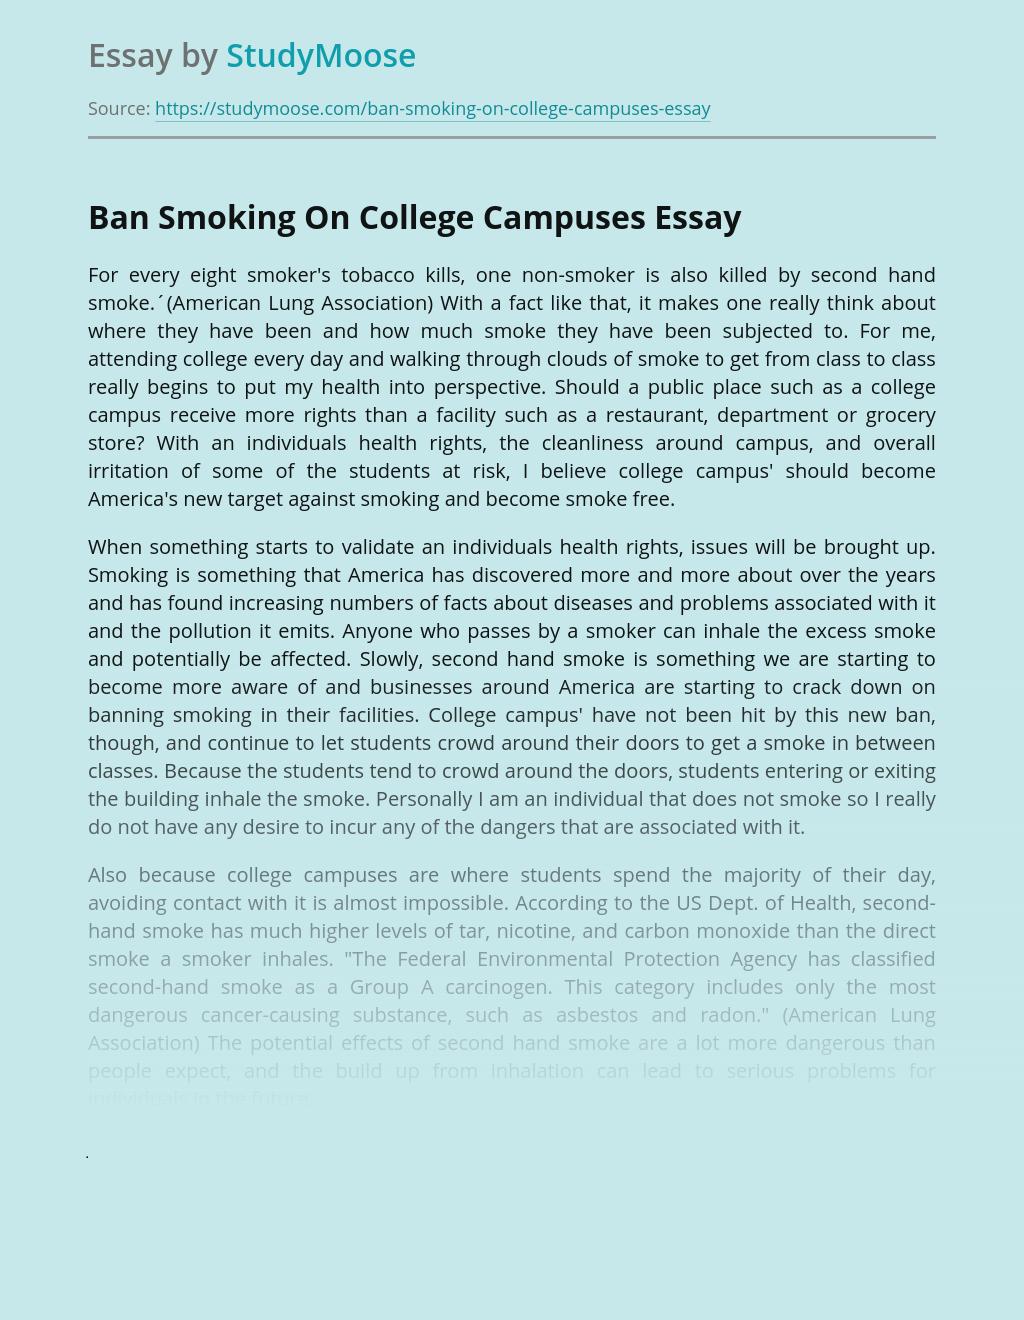 Ban Smoking On College Campuses